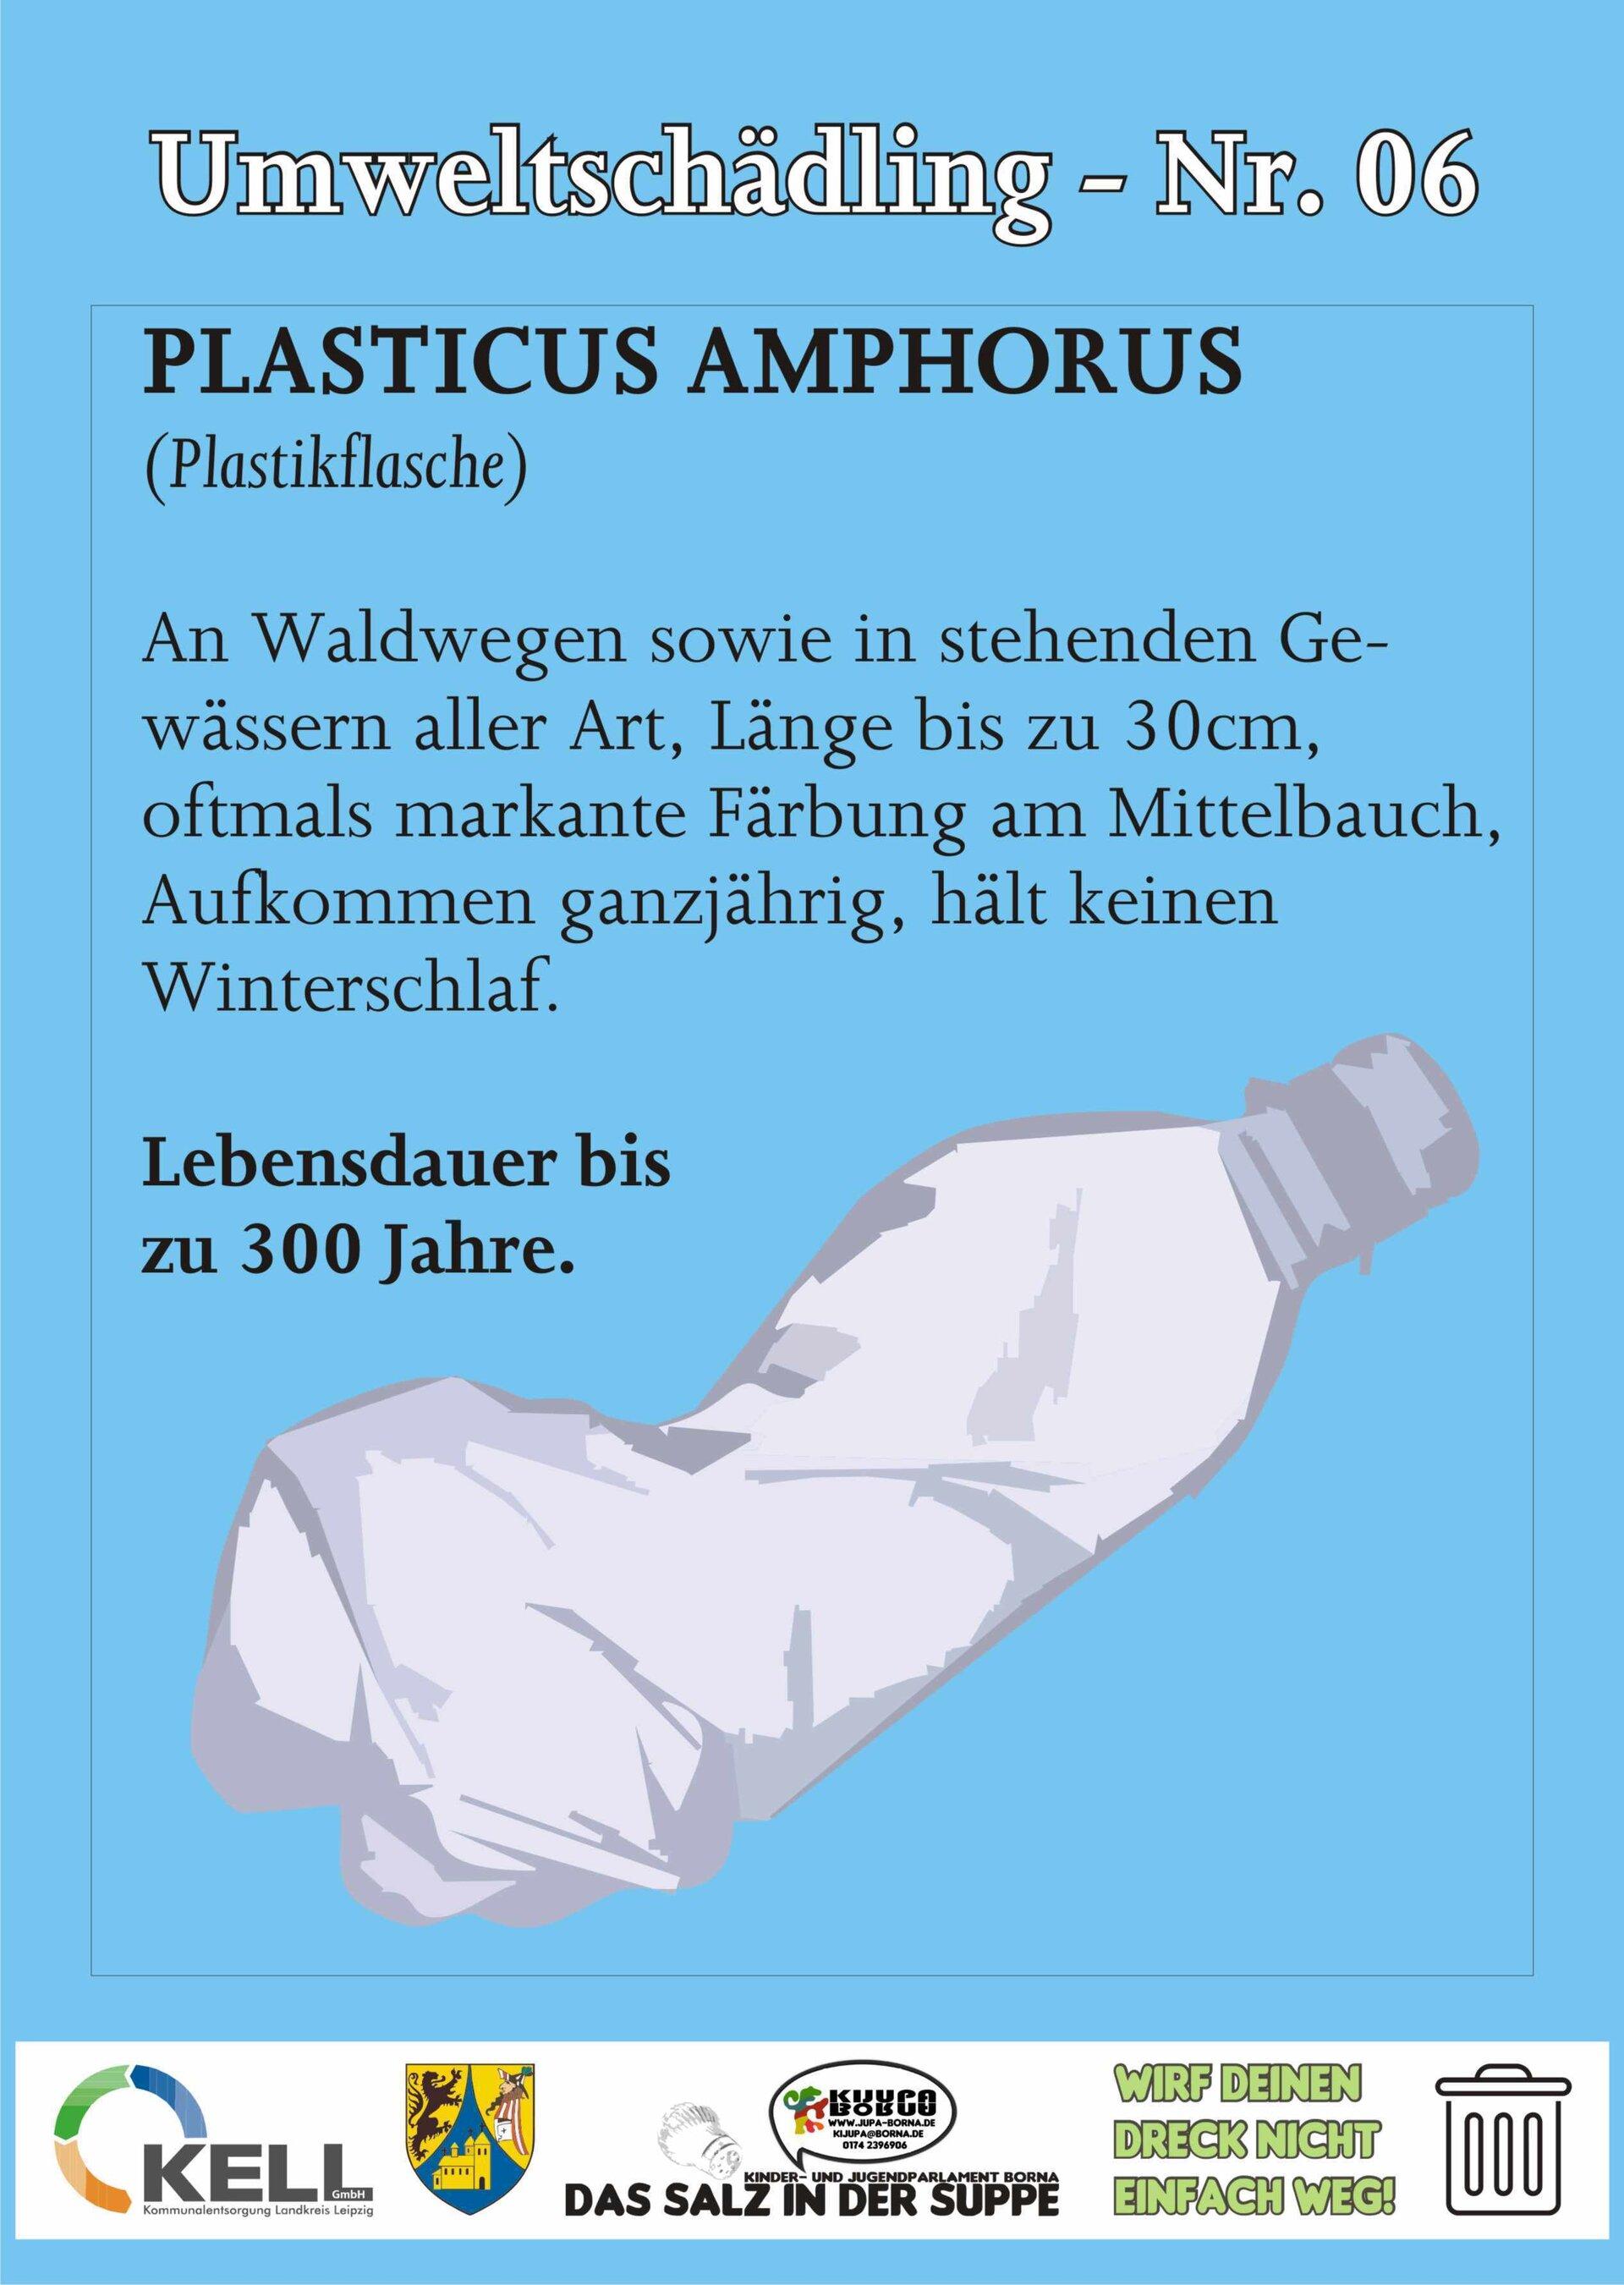 Umweltschädling 06